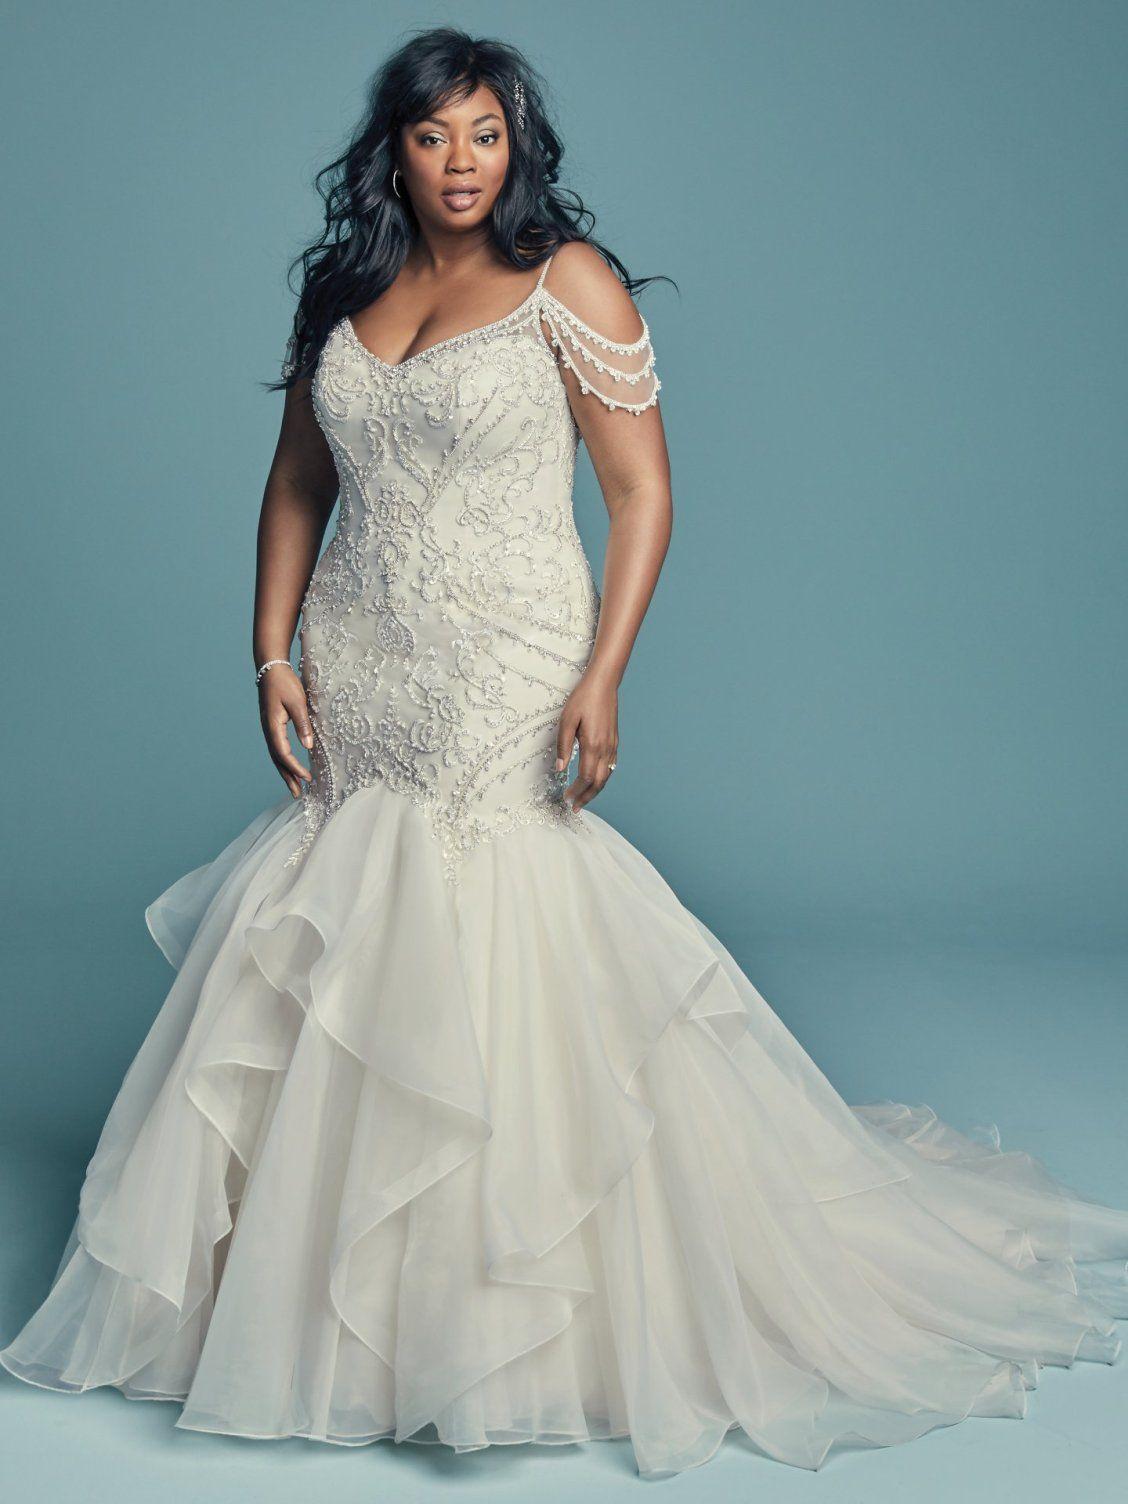 Brinkley Lynette By Maggie Sottero Wedding Dresses Lace Mermaid